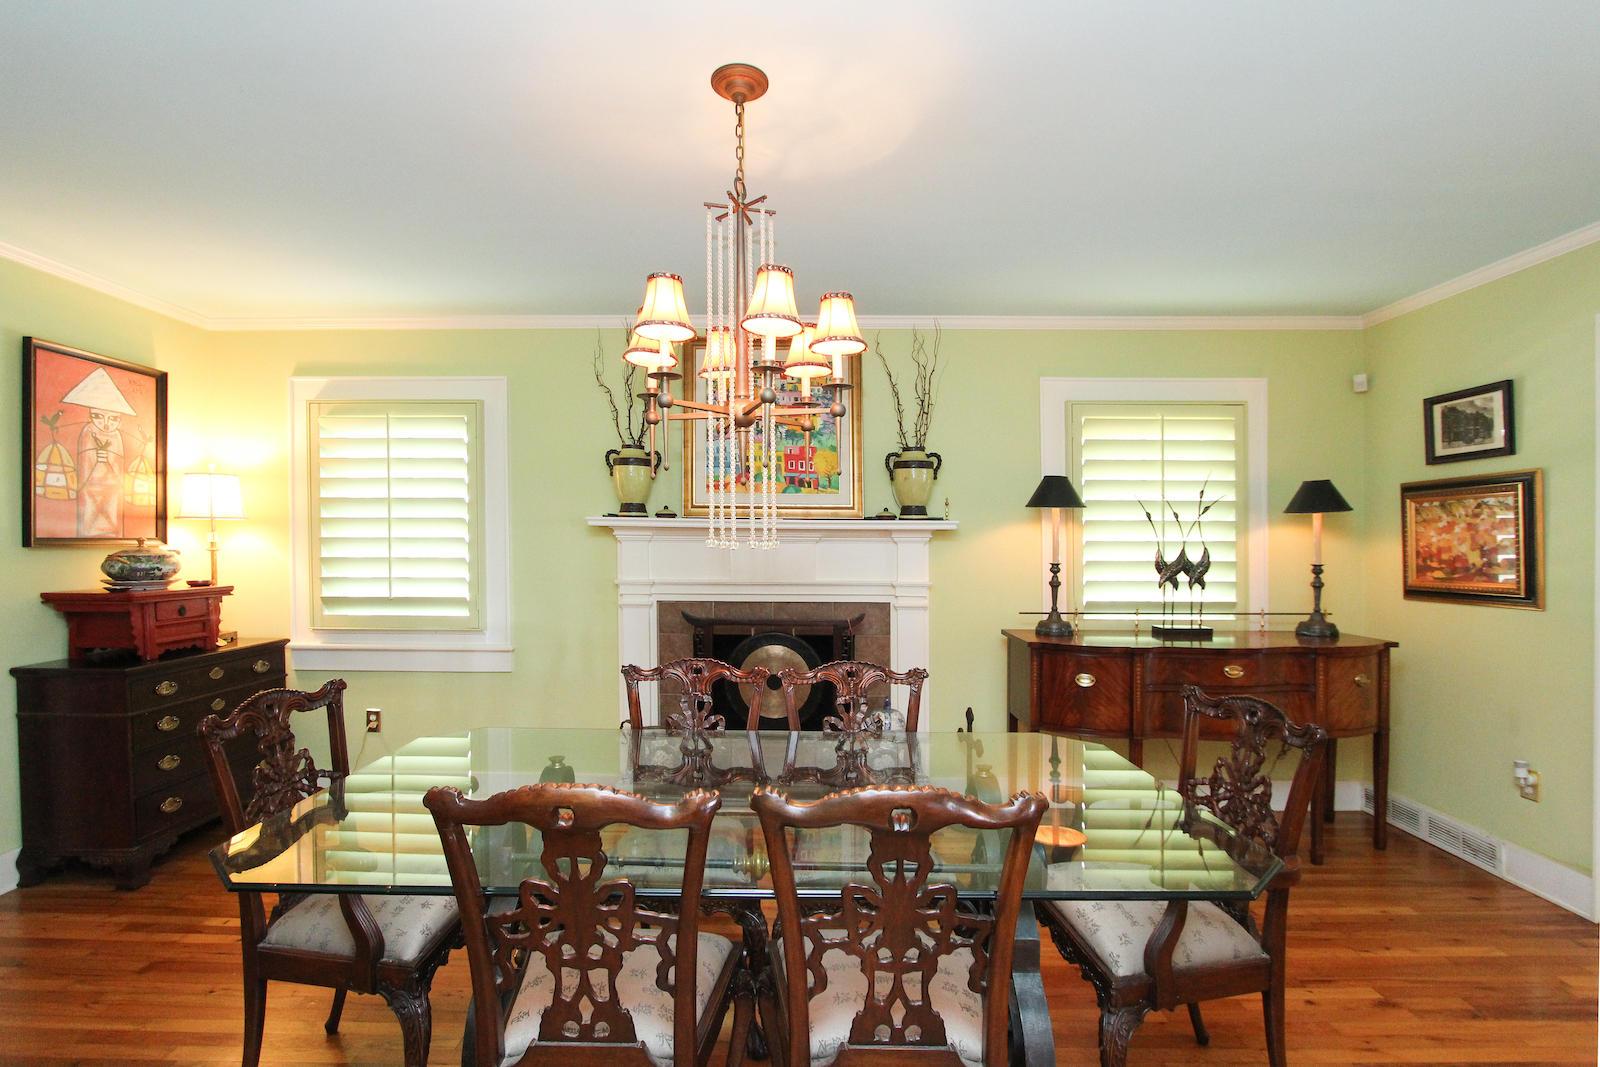 Albemarle Point Homes For Sale - 3 Albemarle, Charleston, SC - 24